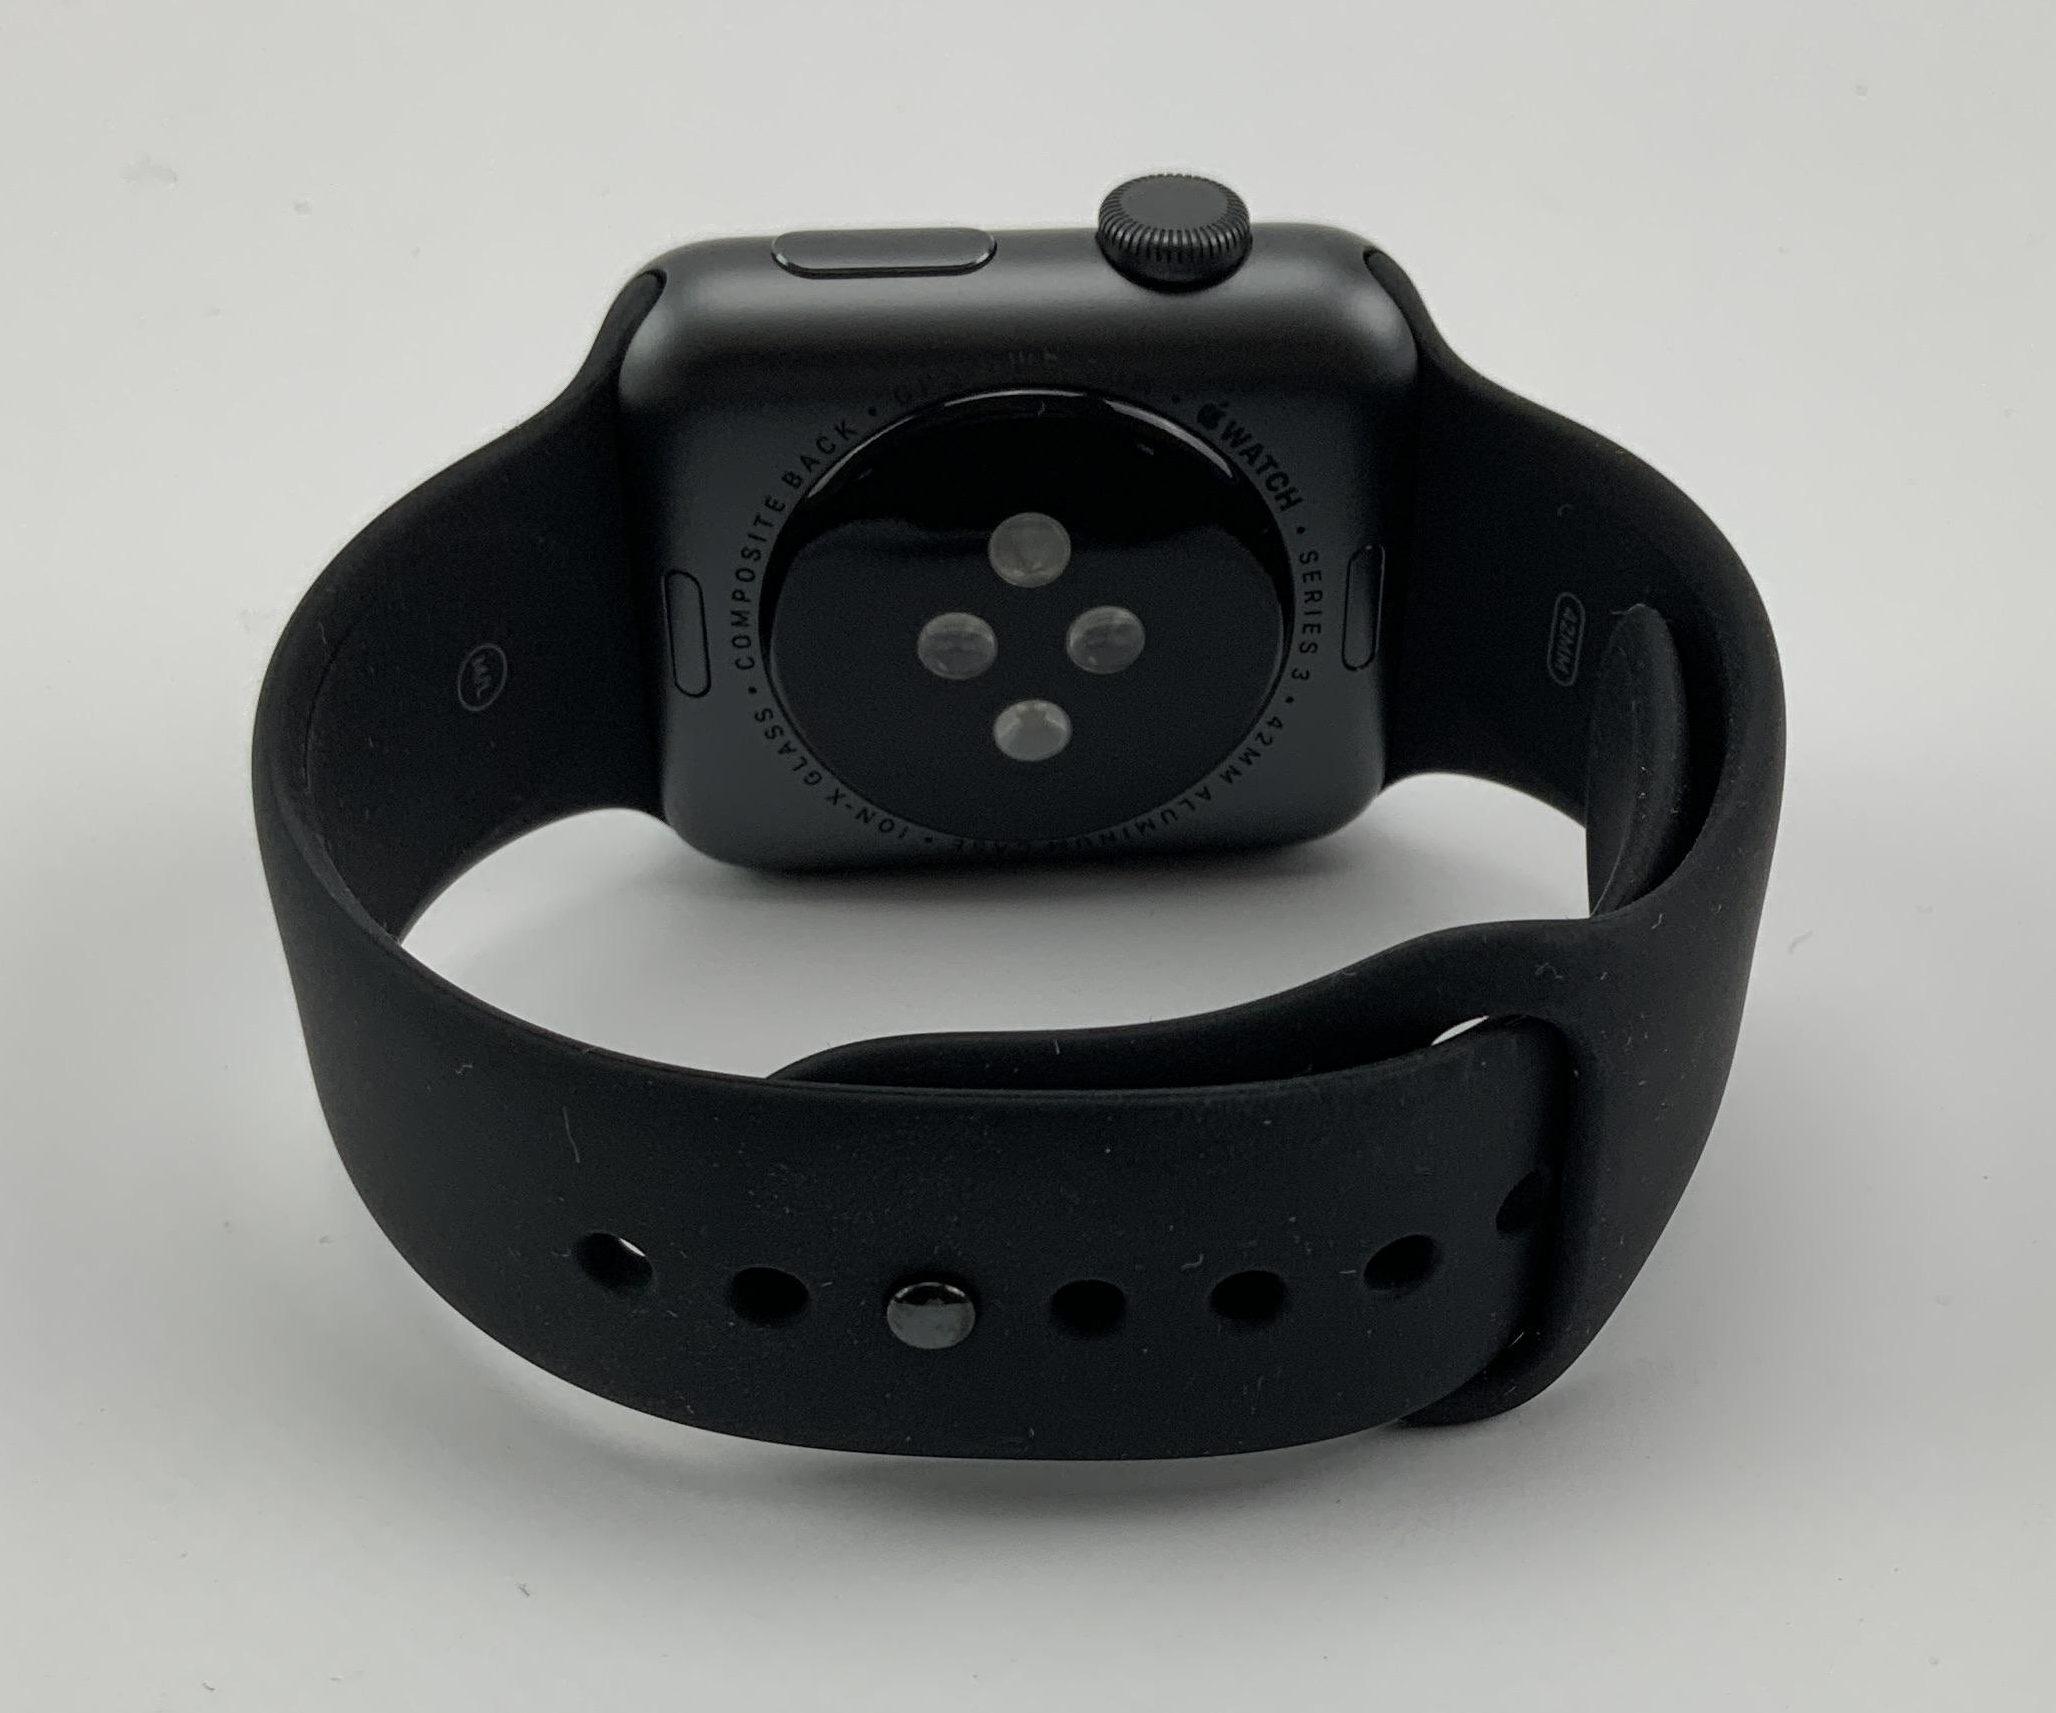 Watch Series 3 Aluminum (42mm), Space Gray, Black Sport Band, imagen 5